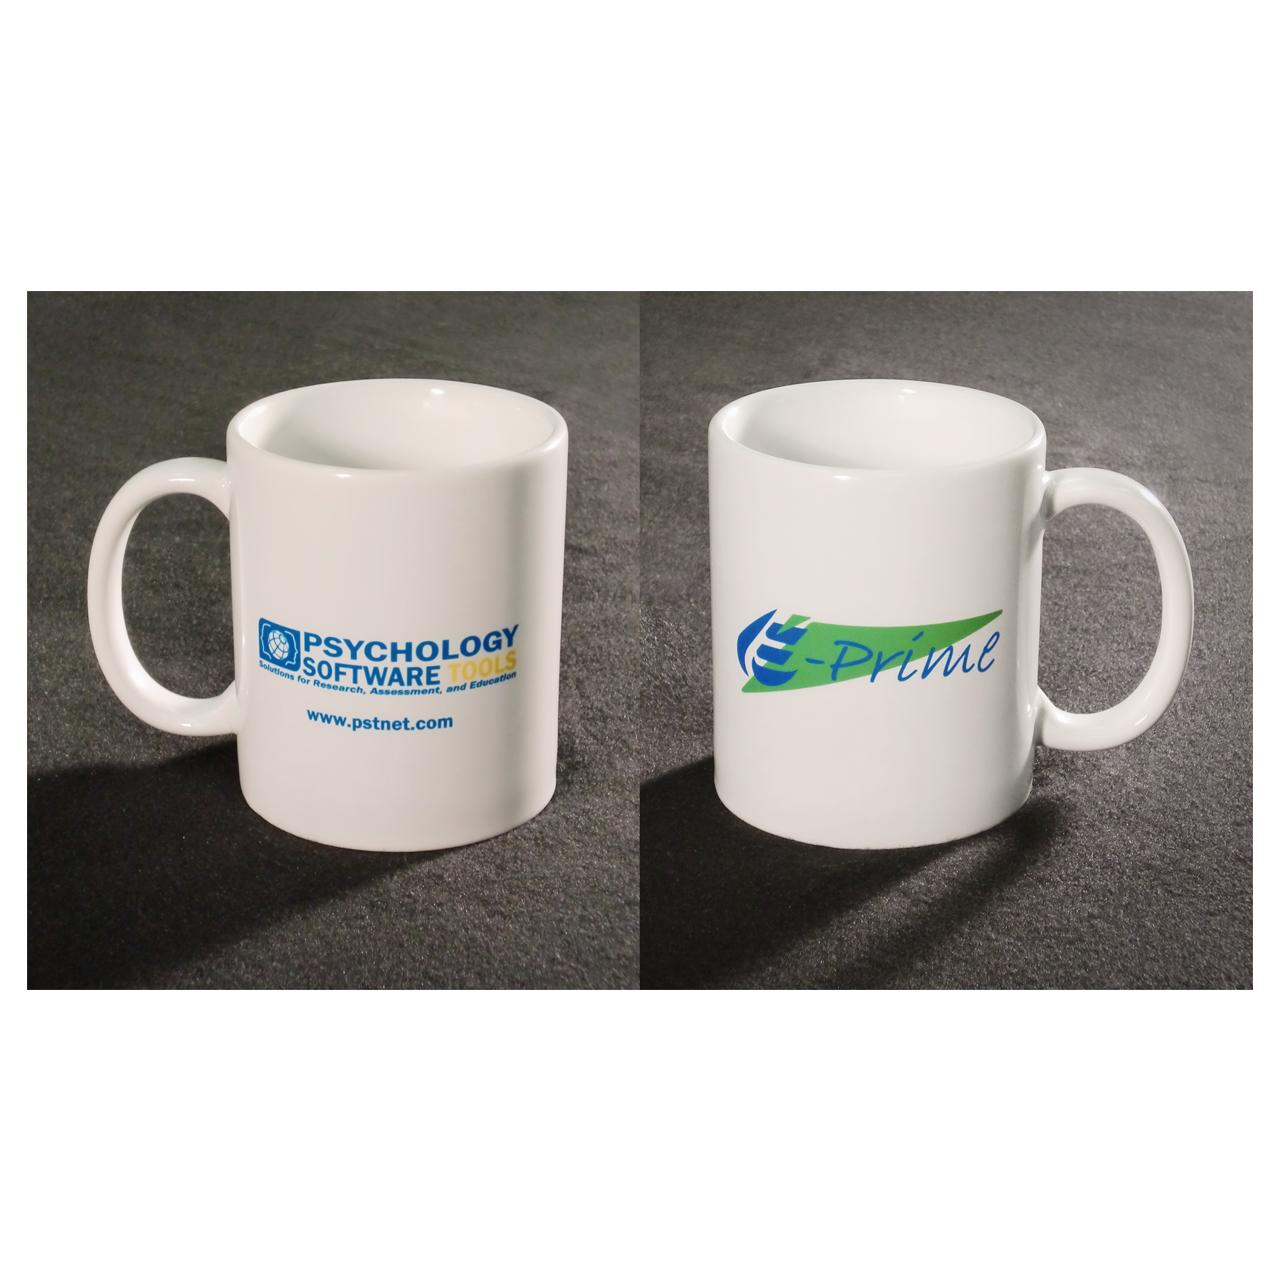 Vintage E-Prime/PST Mug